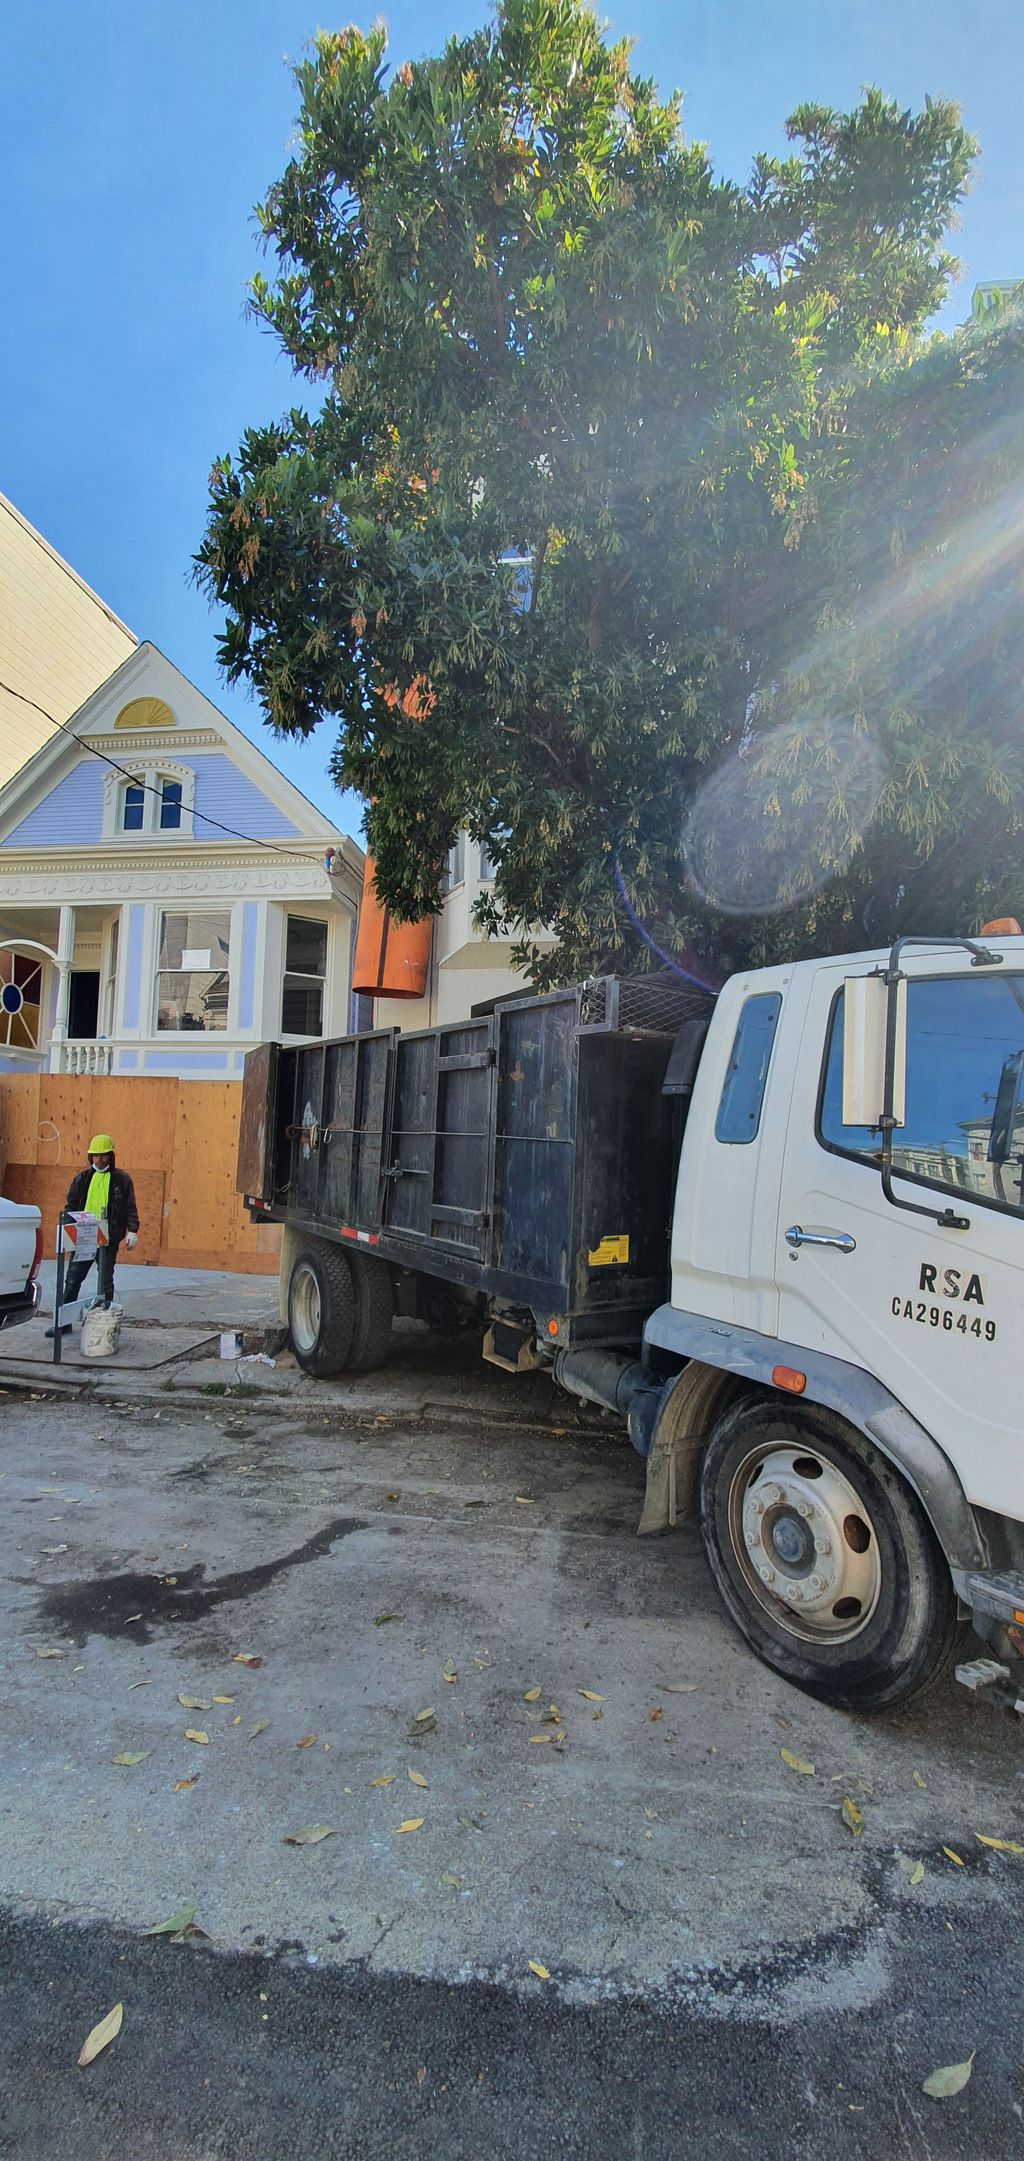 Alansi's hauling & demolition